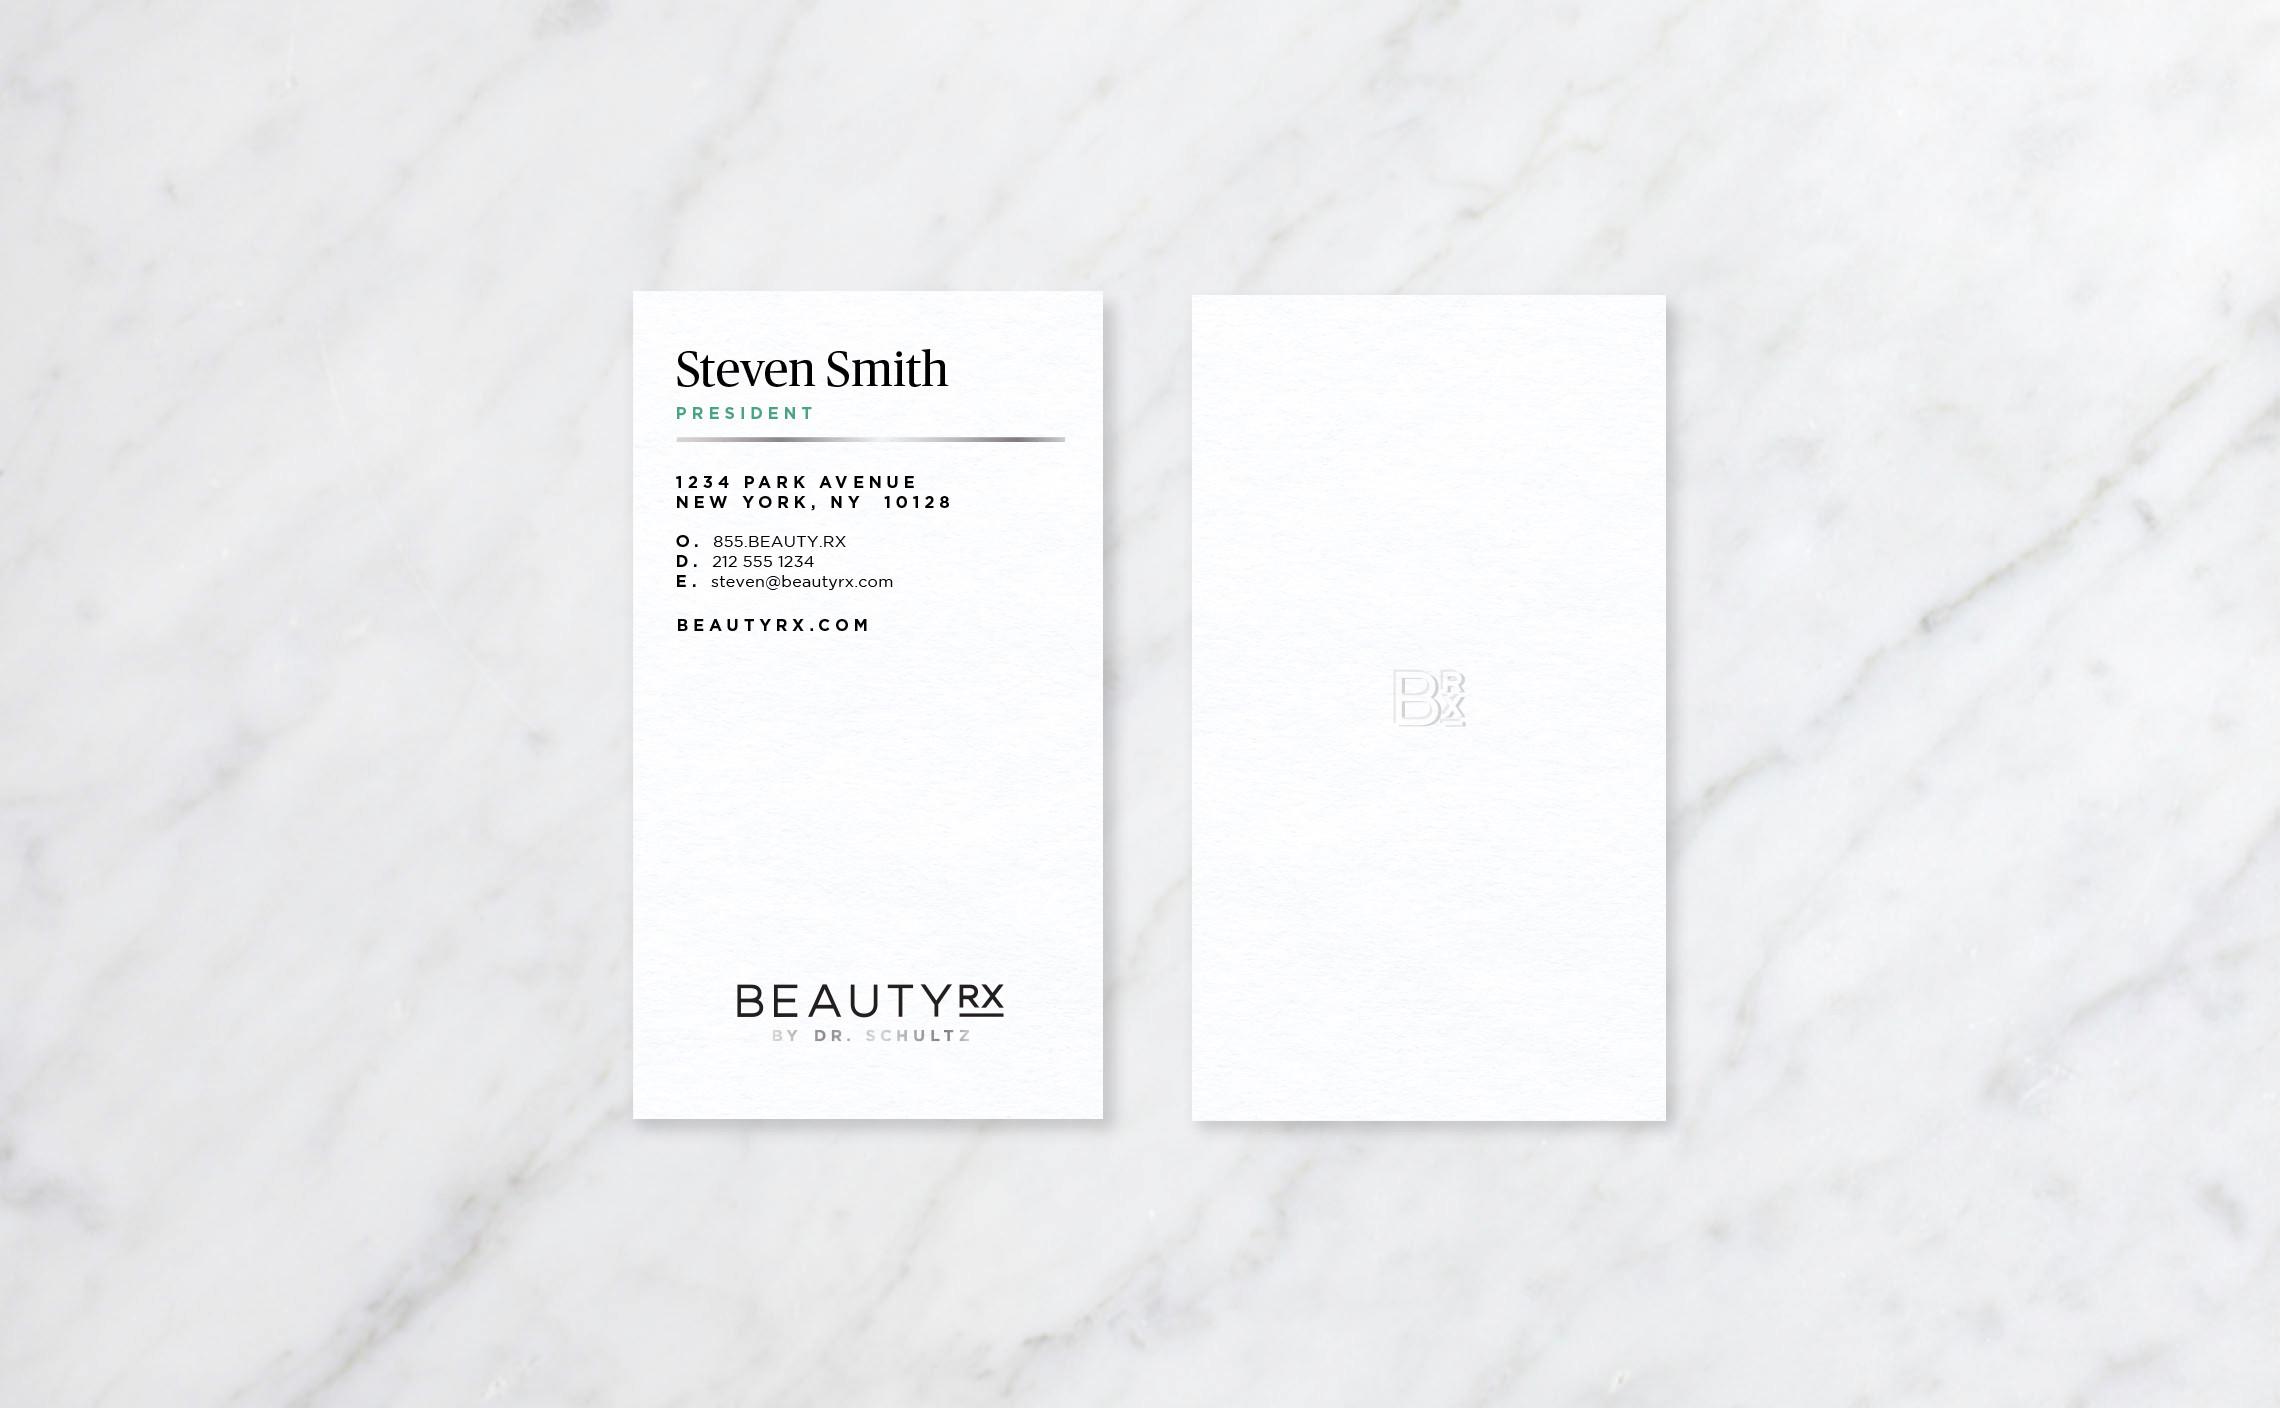 brx-businesscards